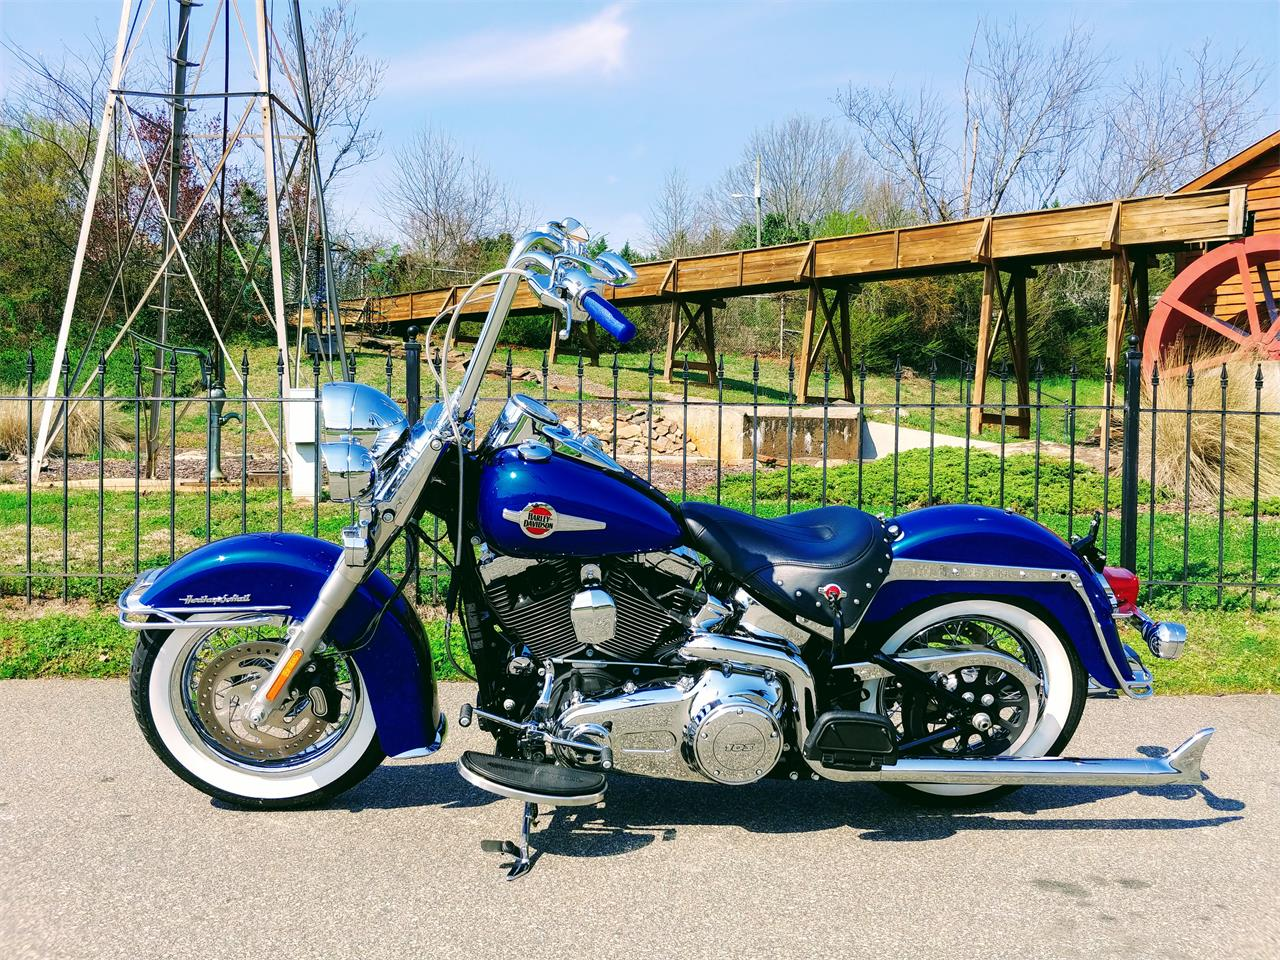 For Sale: 2016 Harley-Davidson Heritage Softail in Cumming , Georgia